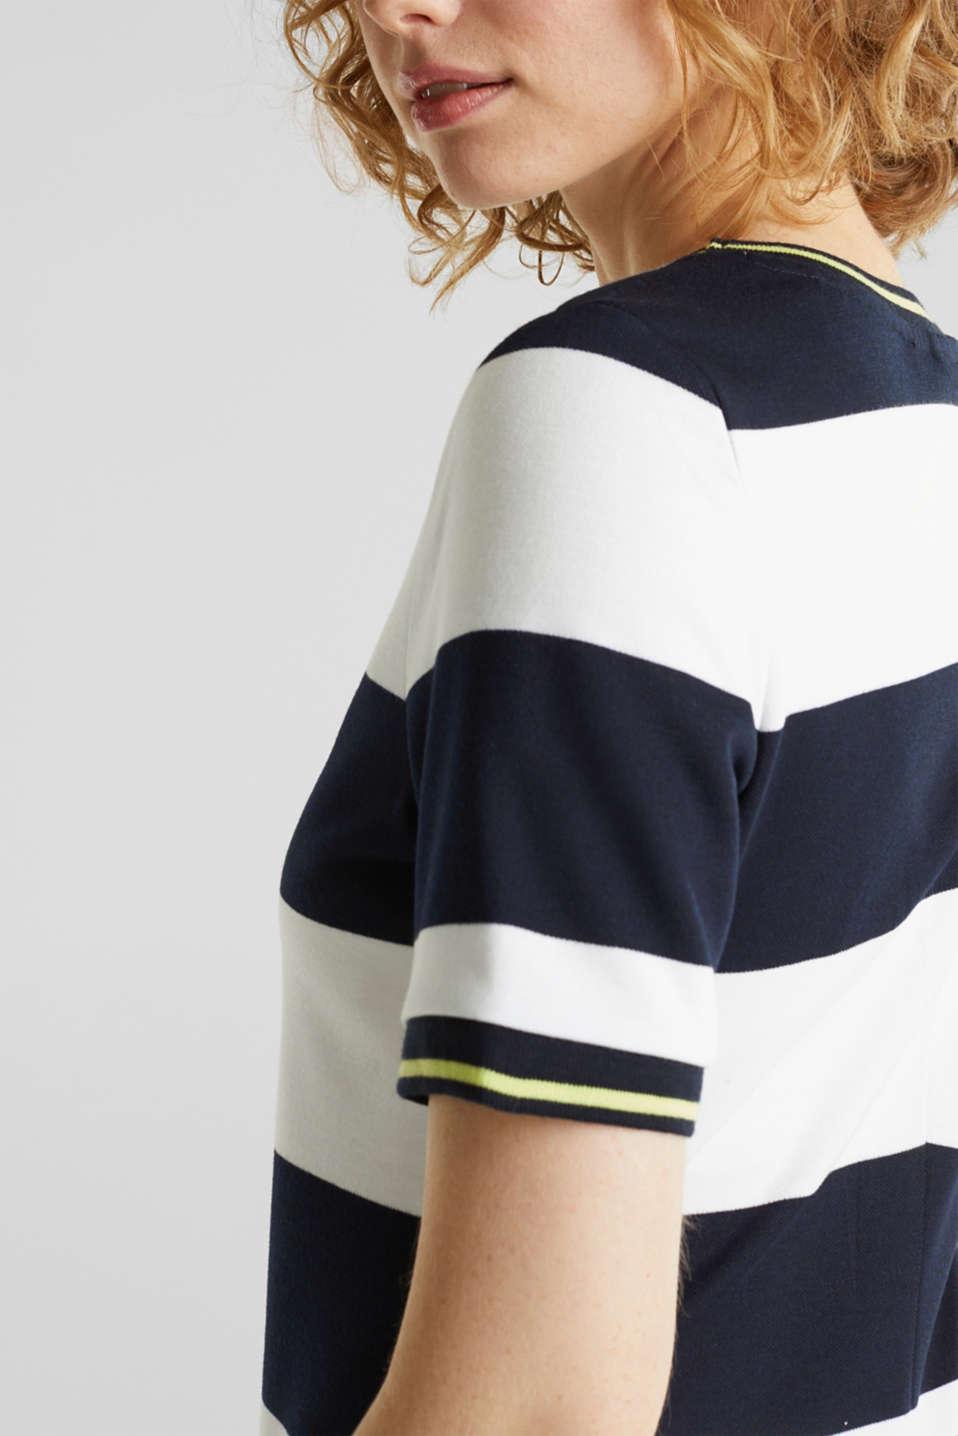 NEON piqué dress with luminous stripes, NAVY, detail image number 3